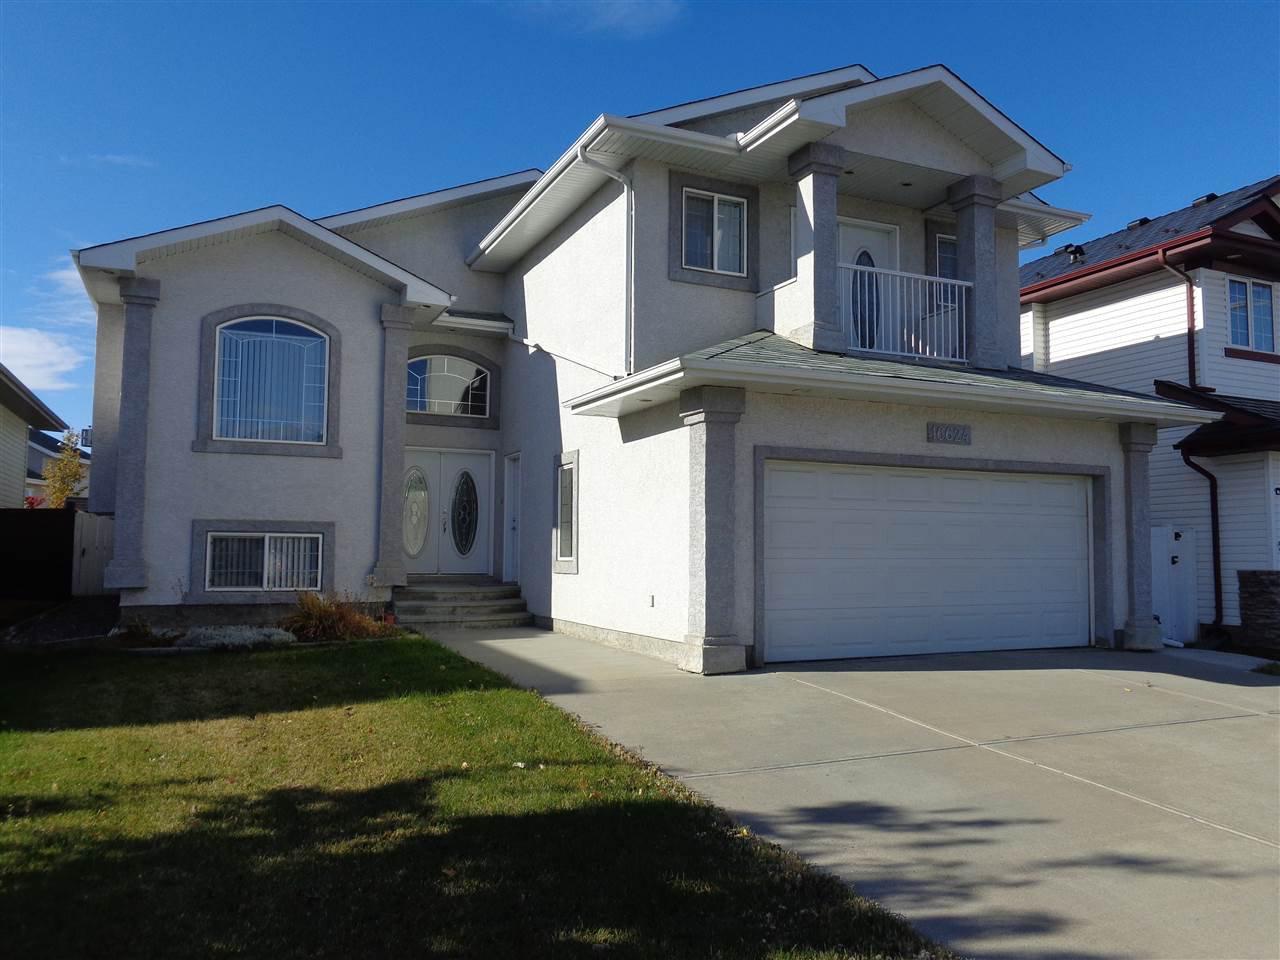 Main Photo: 16624 75 Street in Edmonton: Zone 28 House for sale : MLS®# E4218061